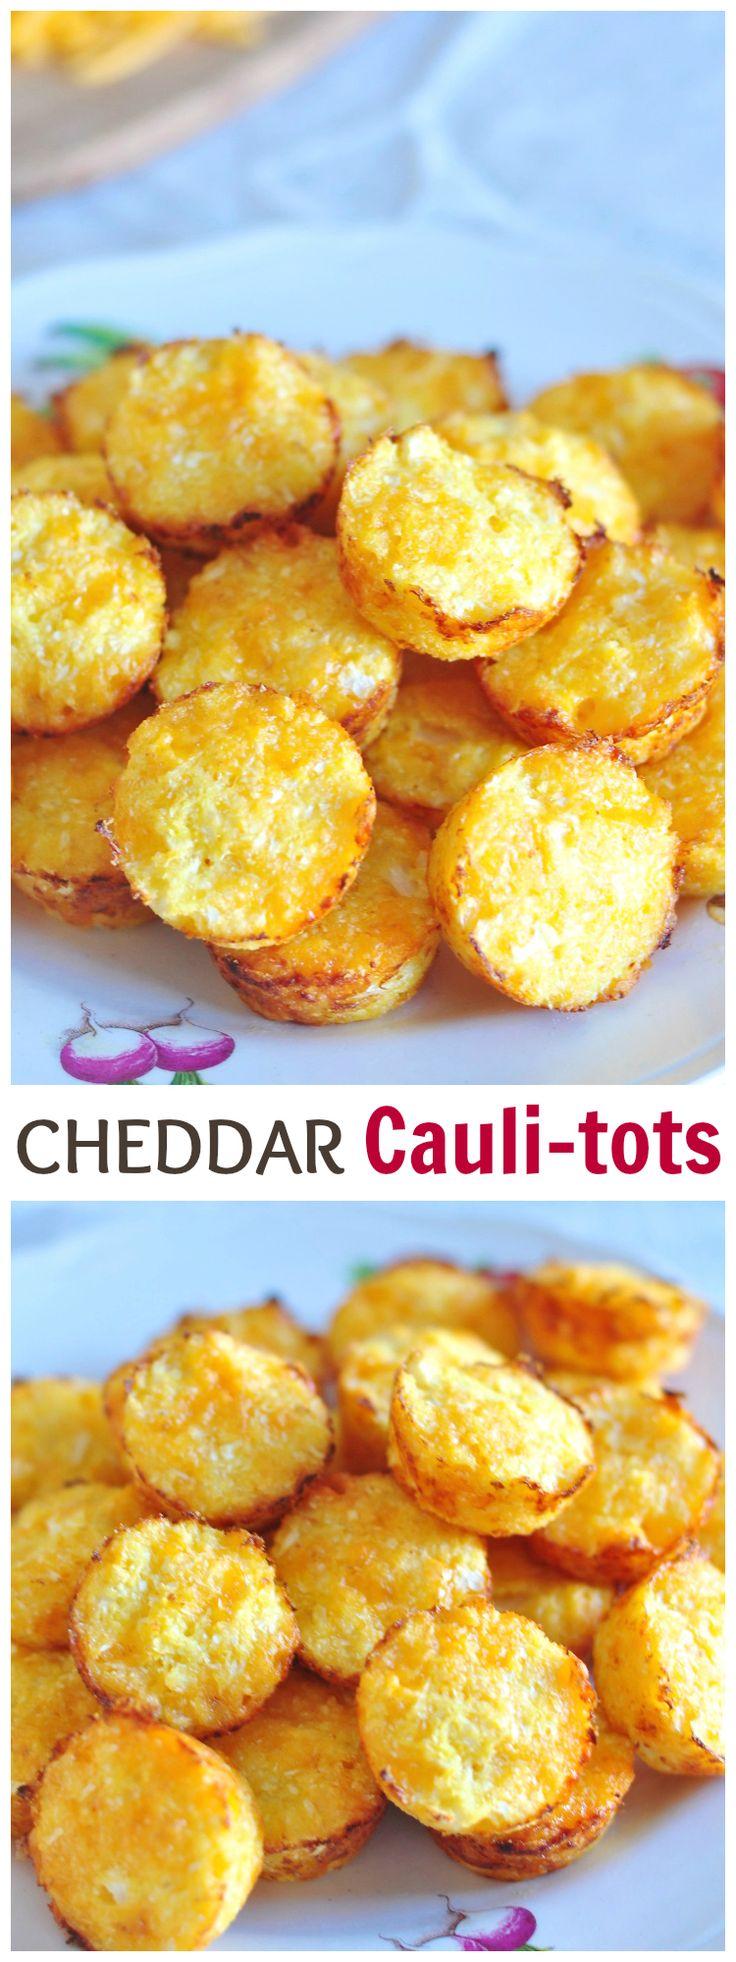 Crispy cheddar cauli-tots #easyrecipe #cauliflower #kidfood